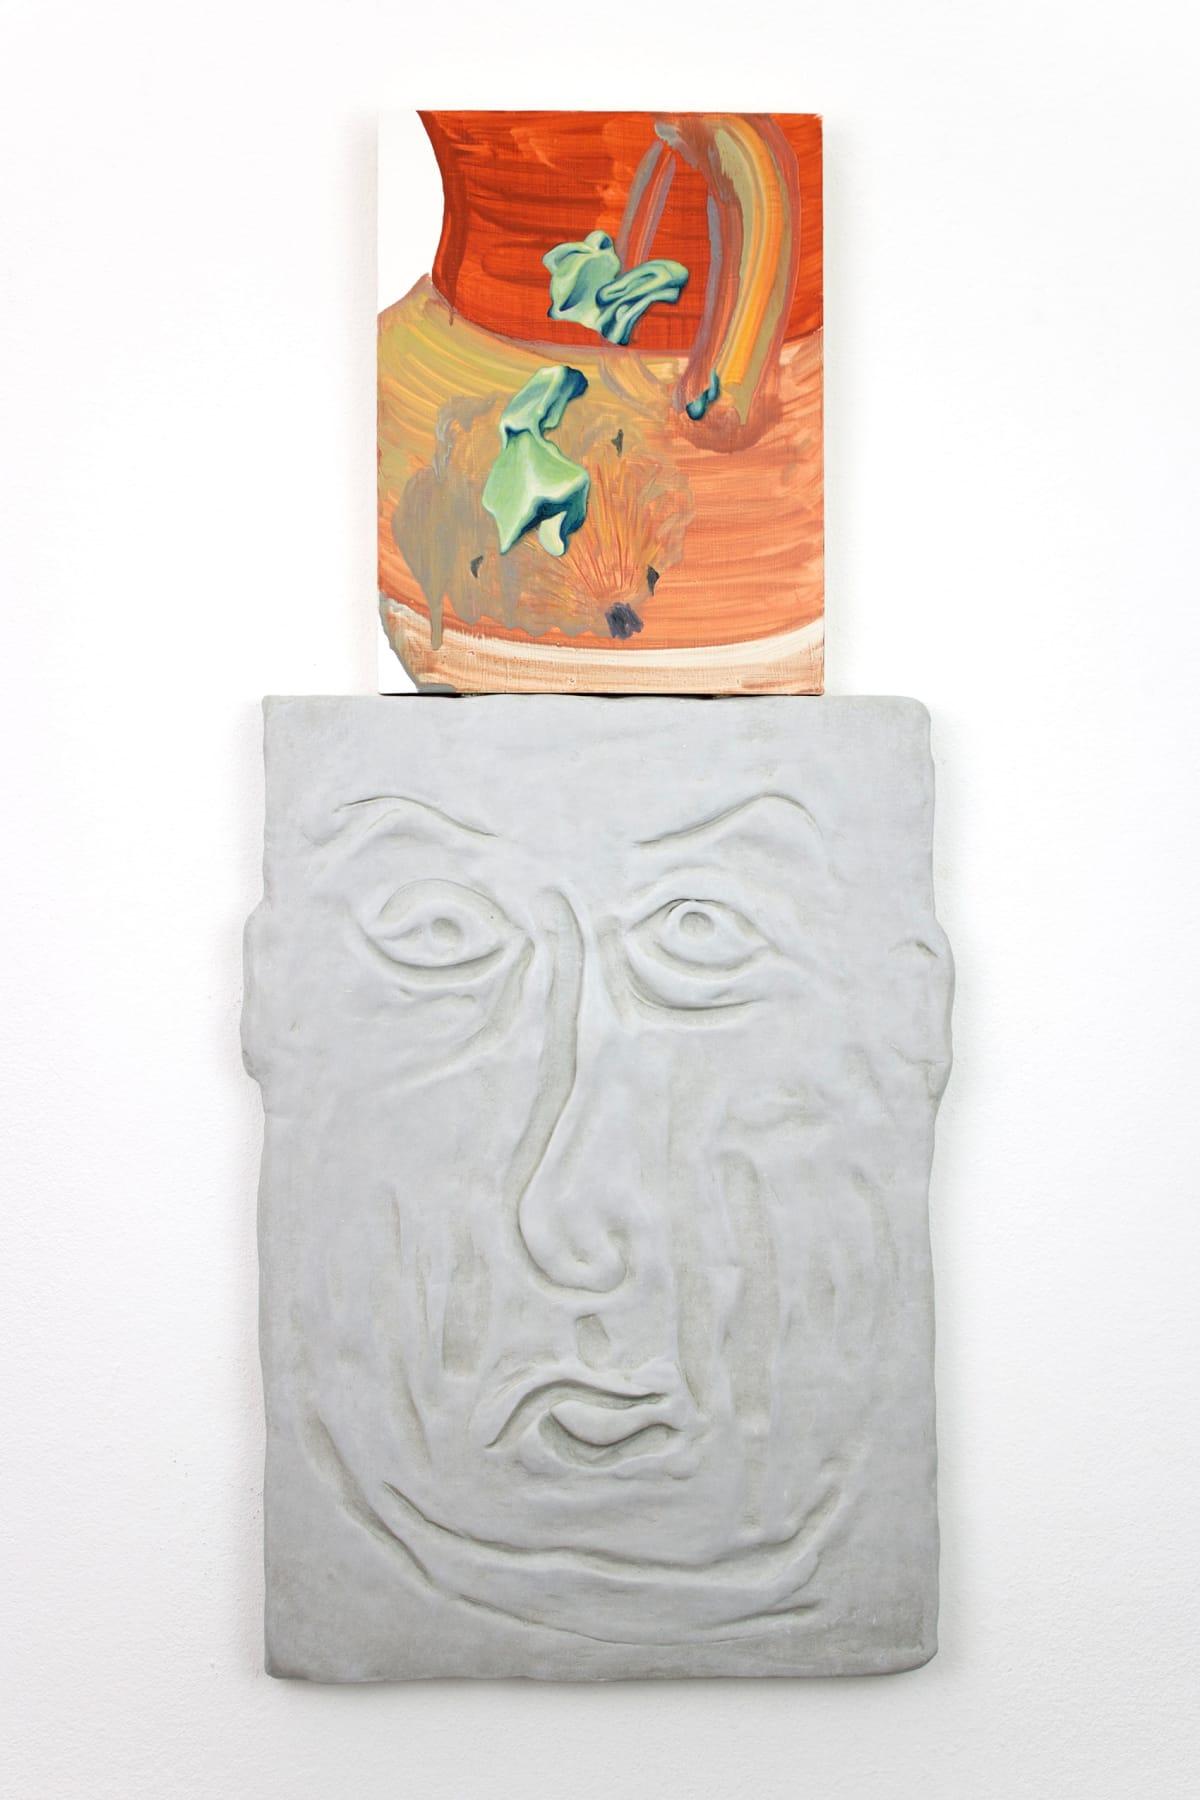 art exhibition, vienna, viewing rooms